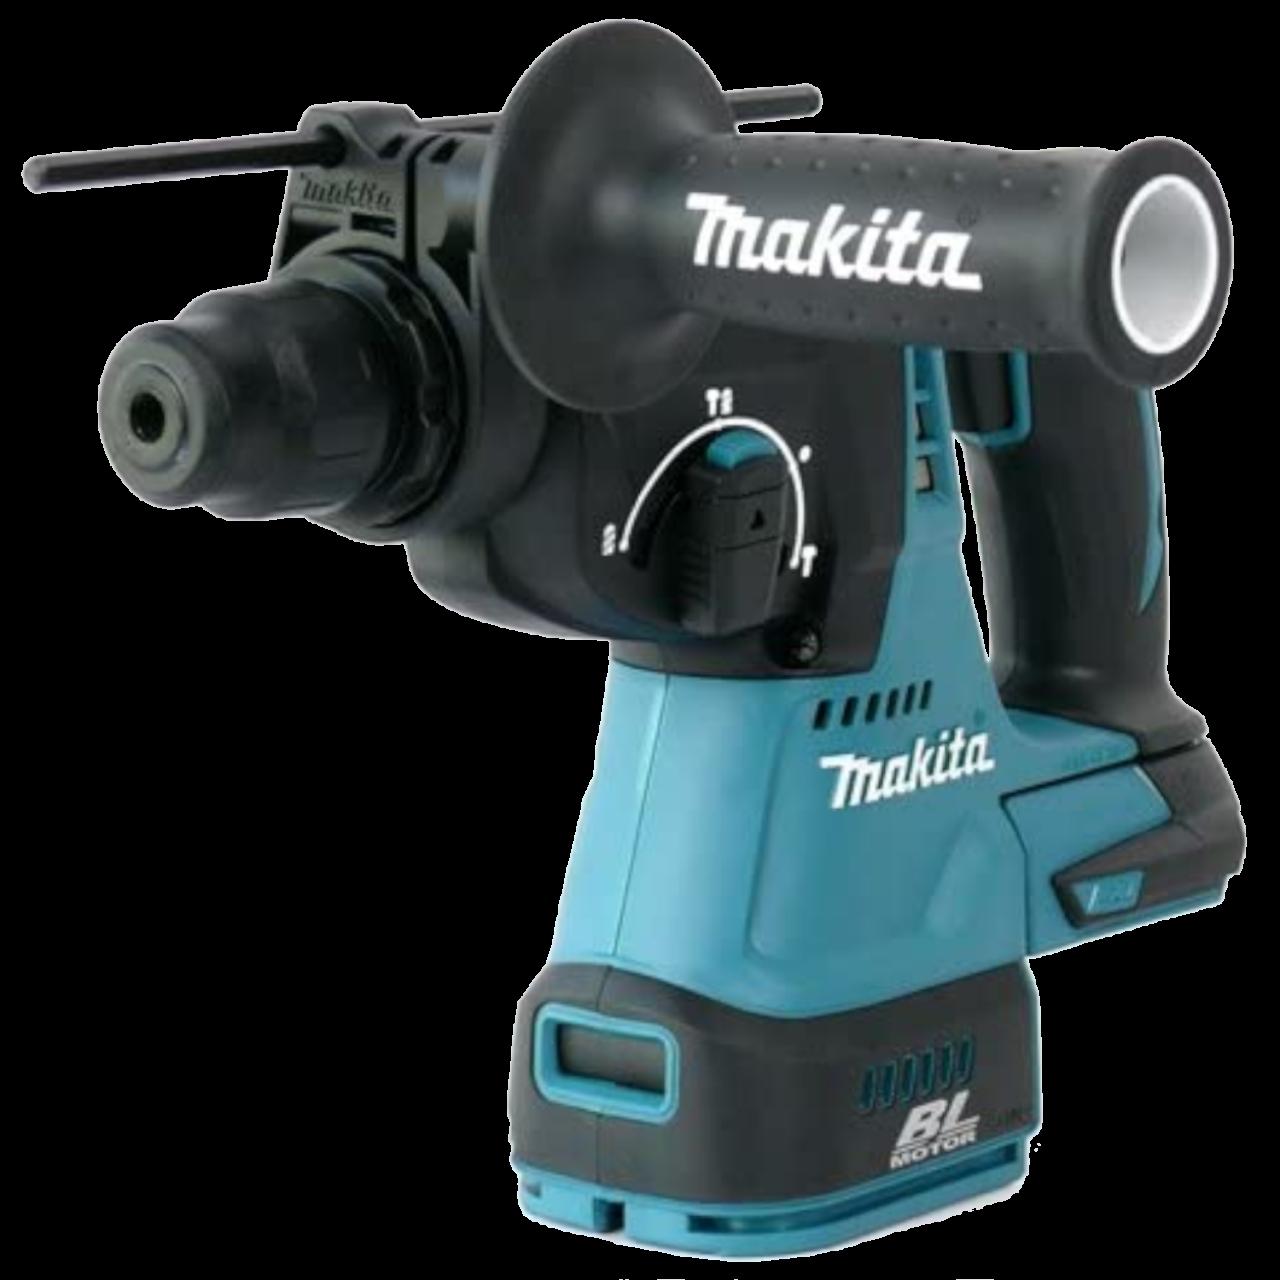 Makita DHR243ZJ Akku-Kombihammer im MAKPAC Gr. 4 inkl. Einlage, 18V, SDS-PLUS, 24 mm, 2,0 J